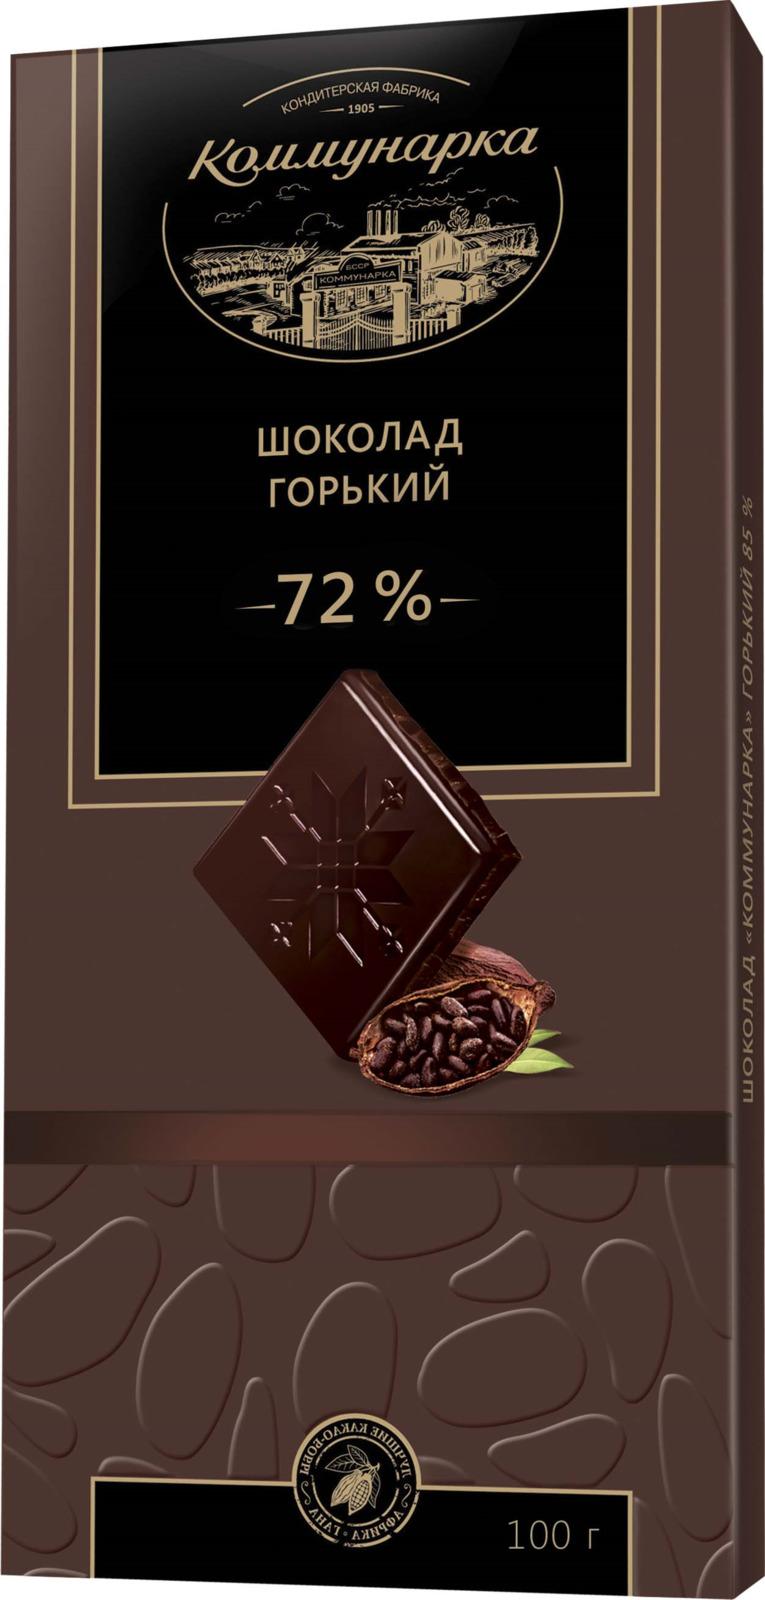 Шоколад Коммунарка, горький 72%, 100 г цена 2017